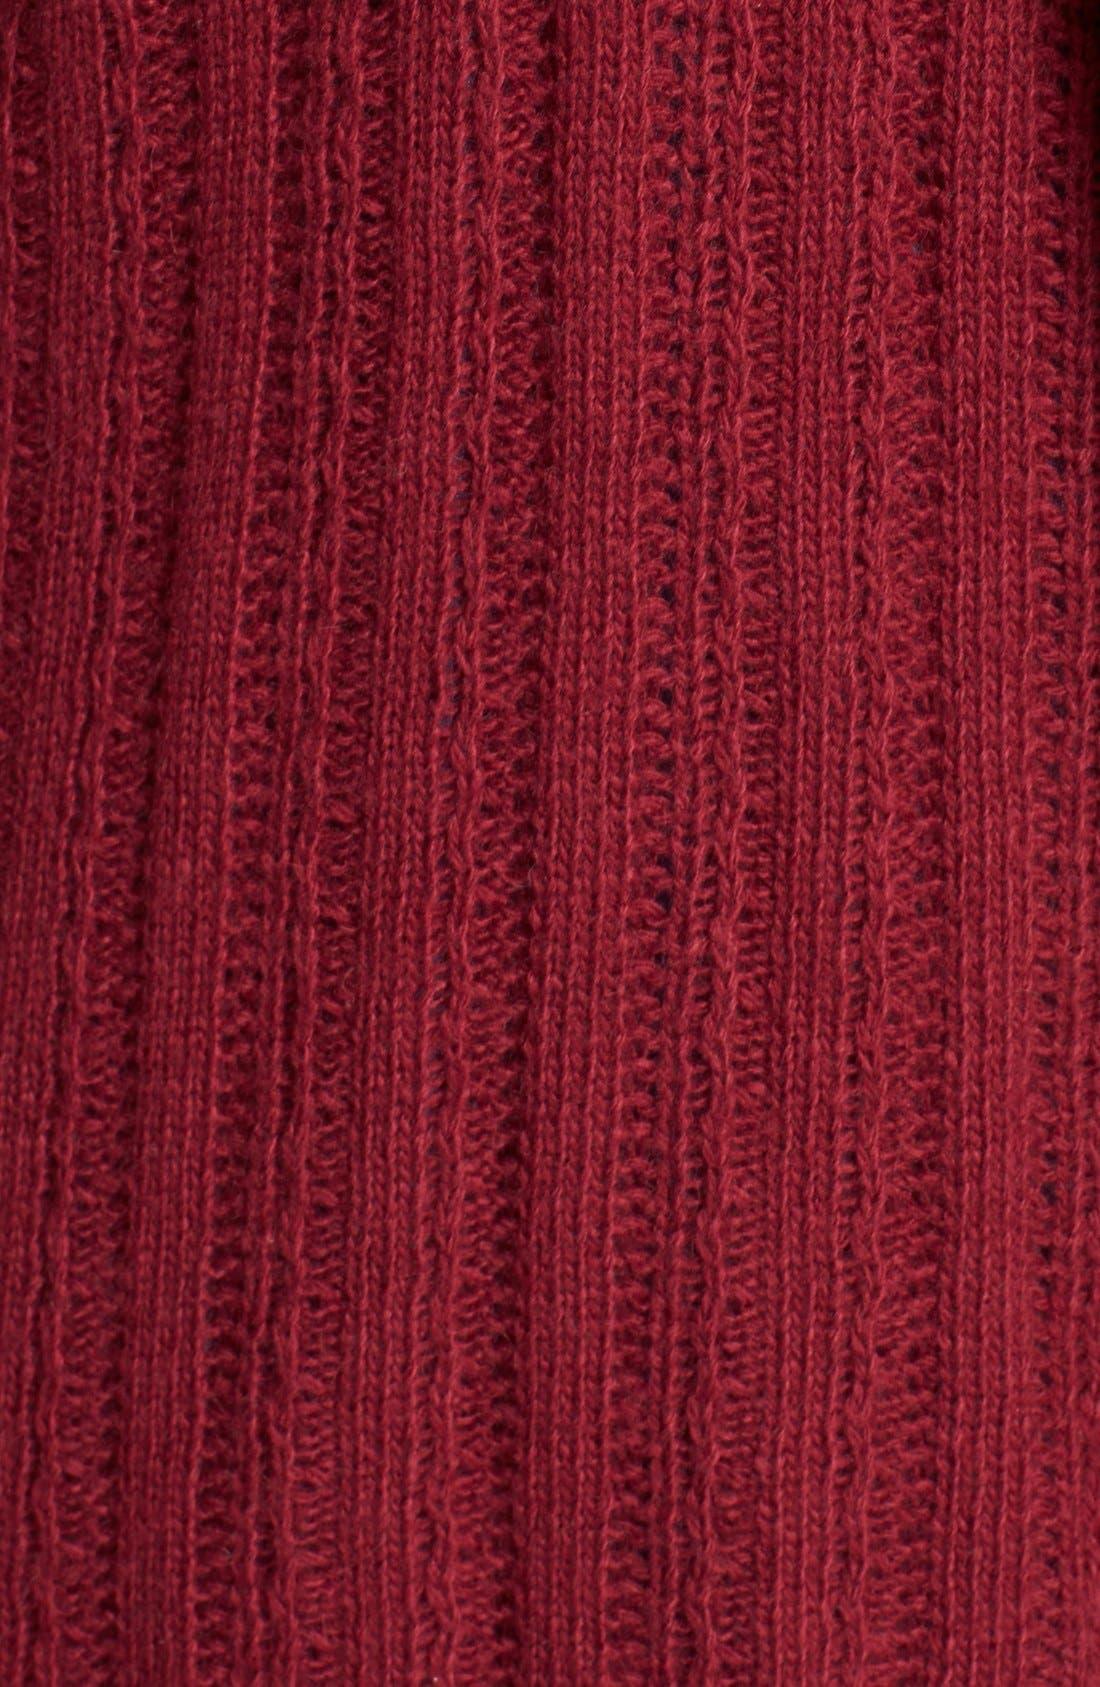 Alternate Image 3  - Lucky Brand 'Venice' Drape Front Sweater (Plus Size)